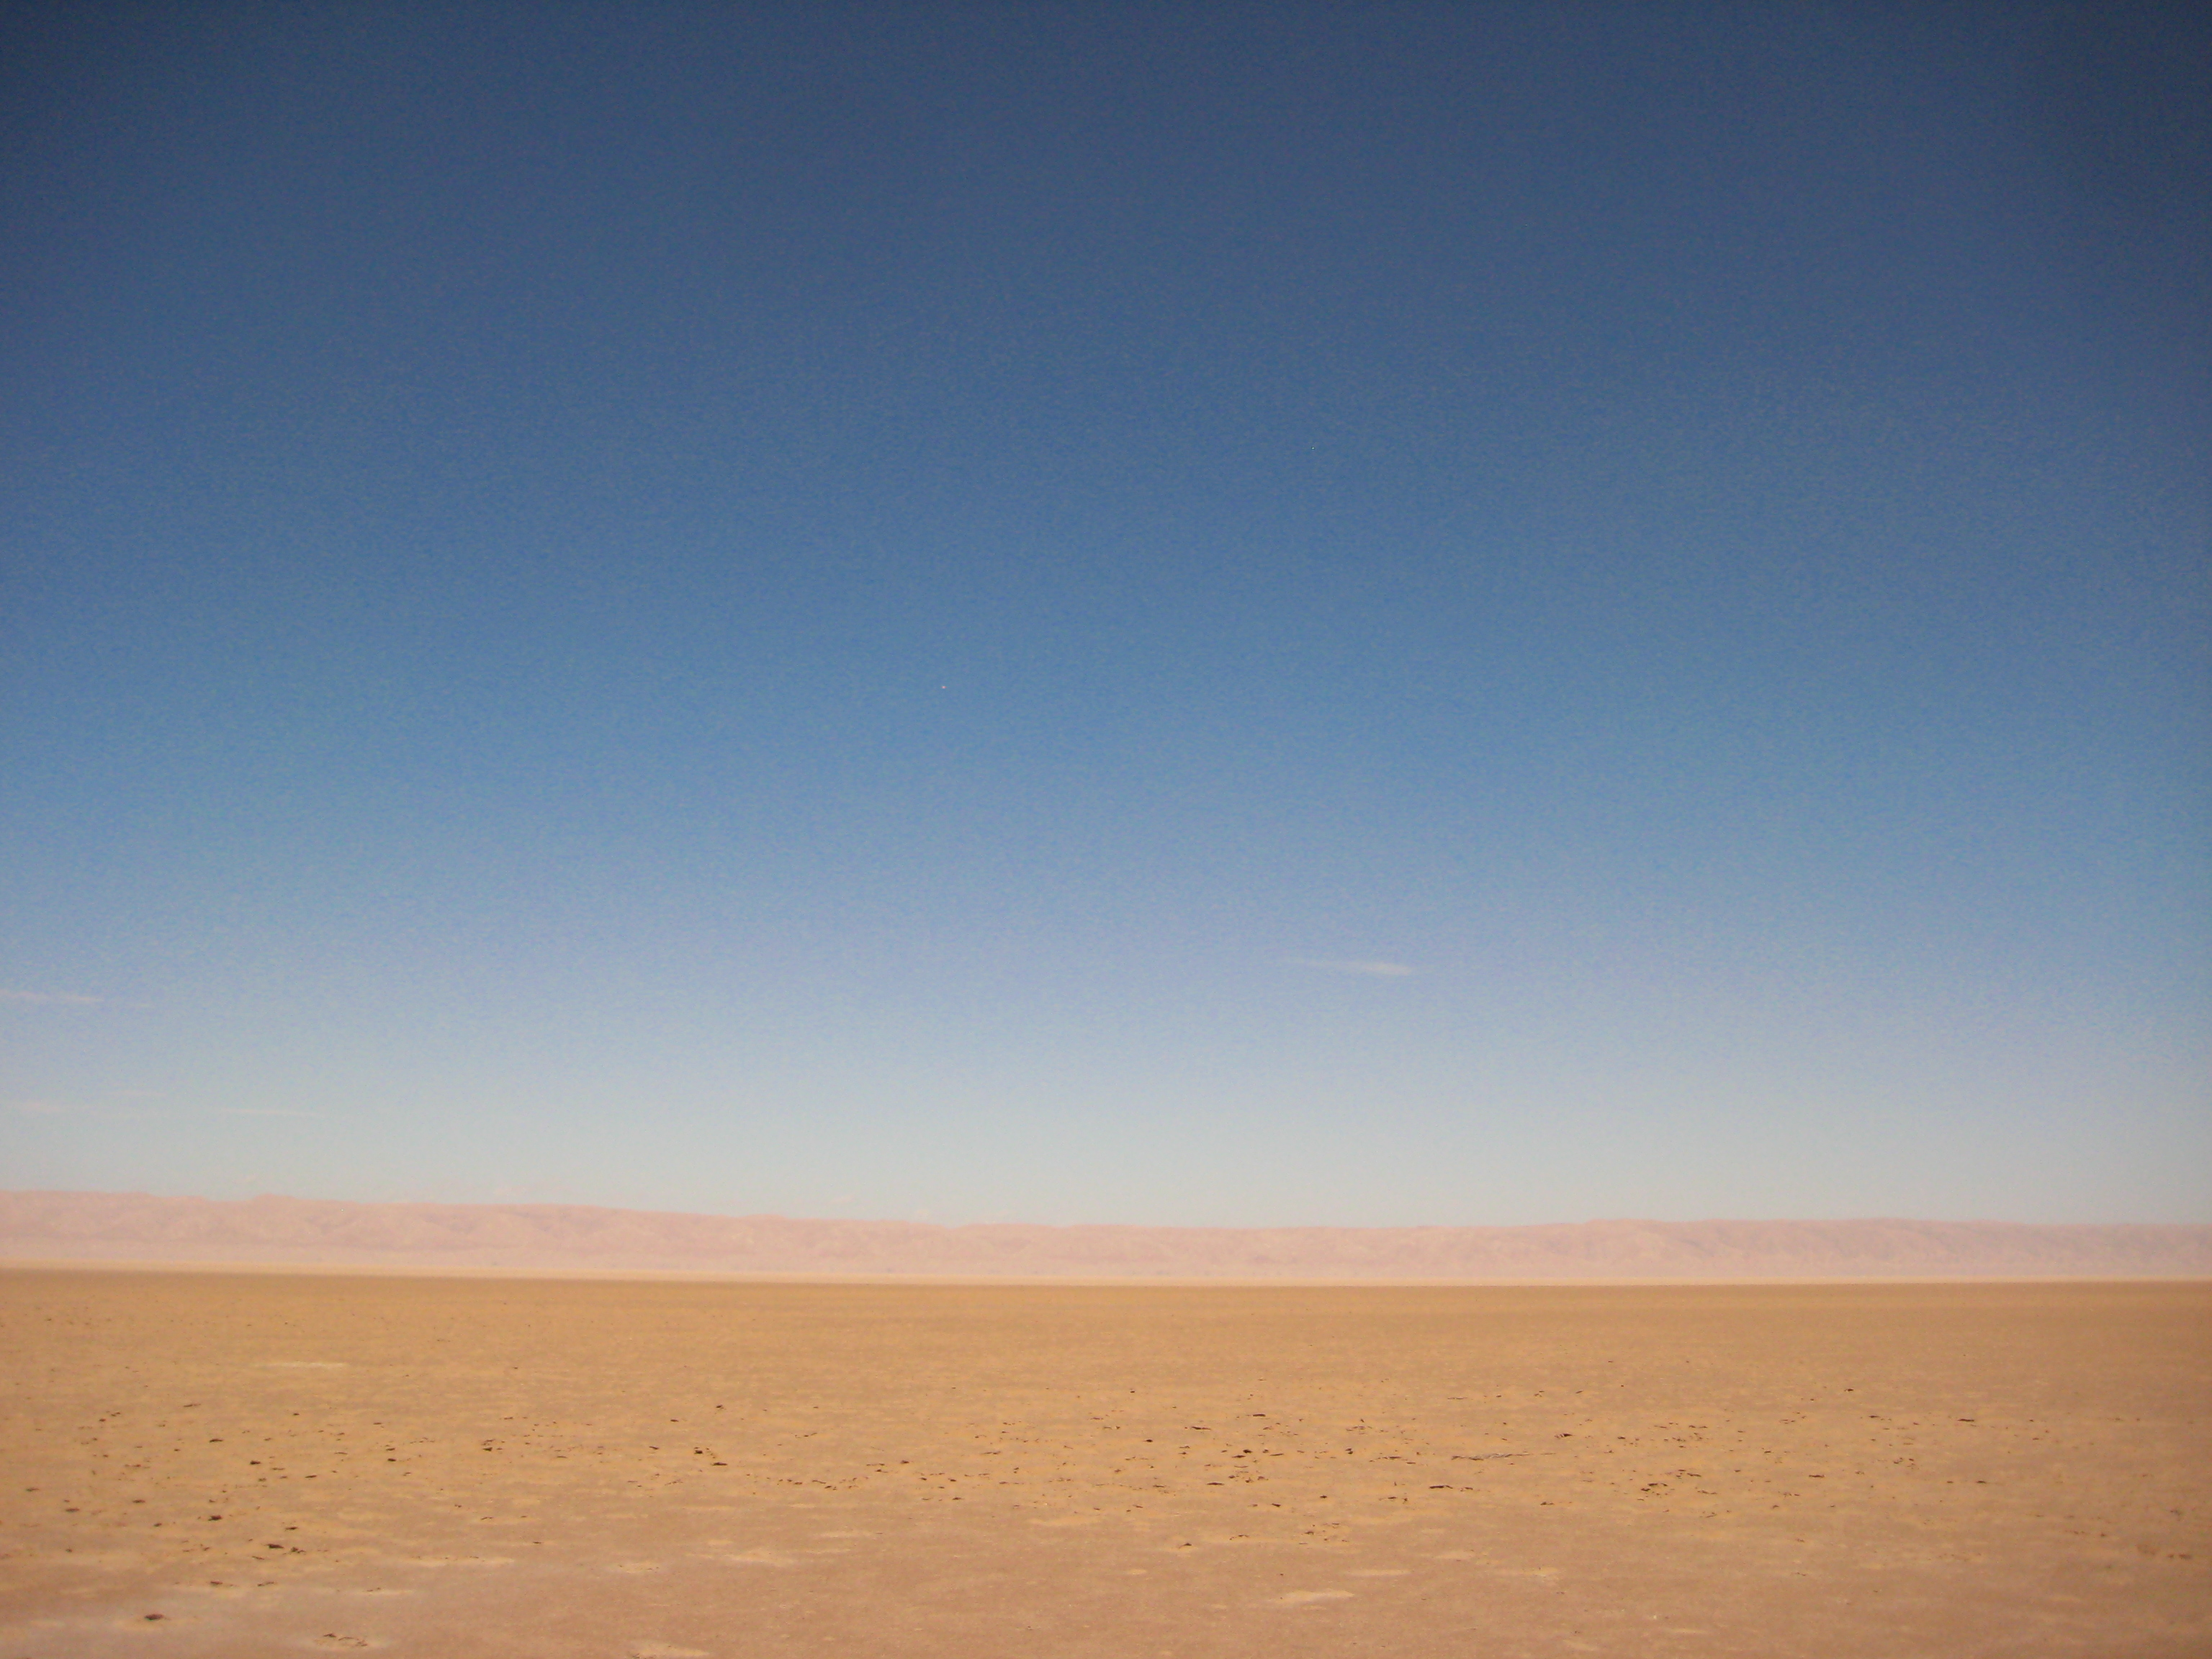 Un paysage lunaire en Tunisie